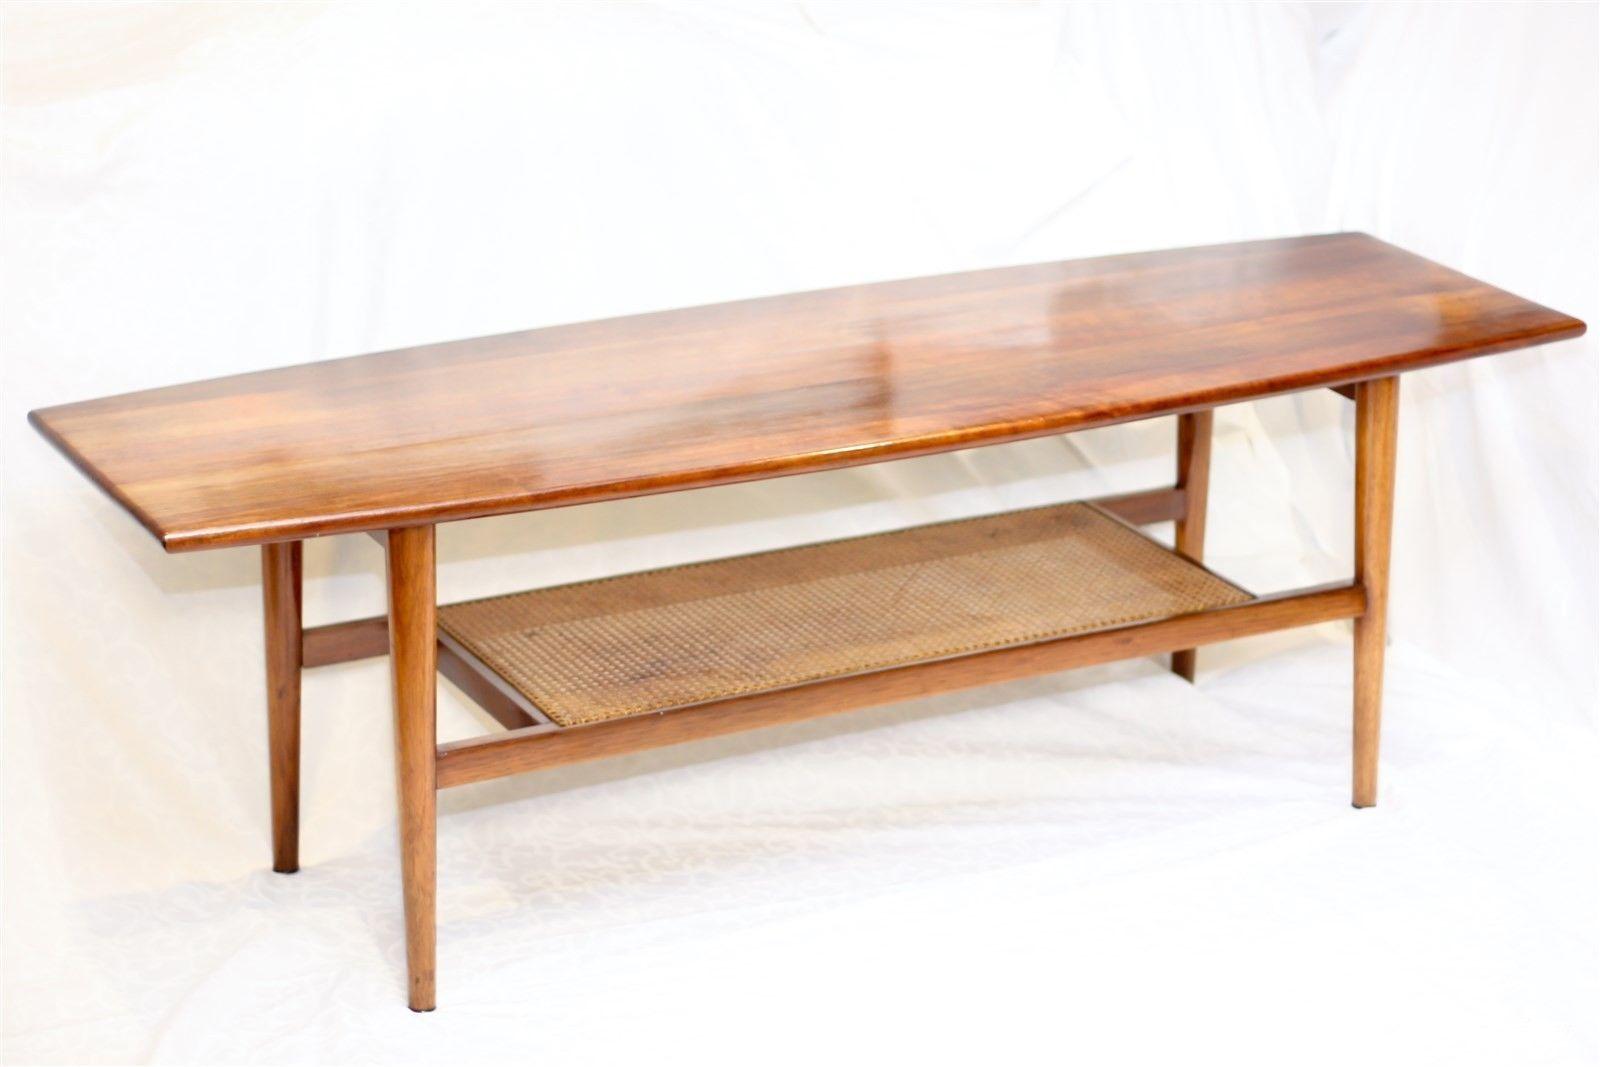 Mid Century Storage Coffee Table Acorn Mid Century Coffee Table Mid Century Modern Coffee Table Coffee Table Wood [ 1200 x 1200 Pixel ]